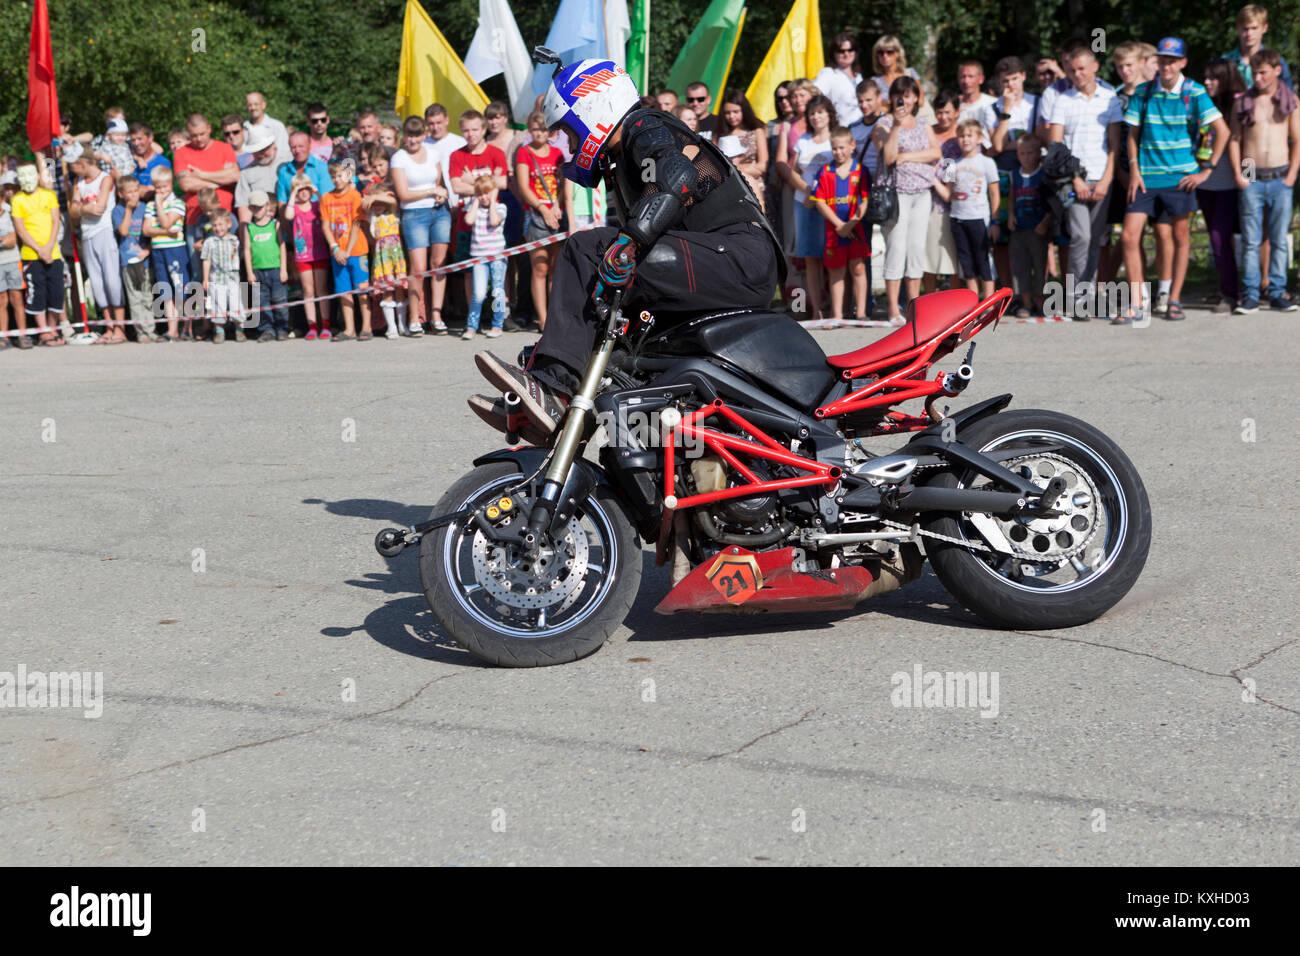 Verkhovazhye, Vologda region, Russia - August 10, 2013: Alexei Kalinin motorcycle show in the village Verkhovazhye - Stock Image